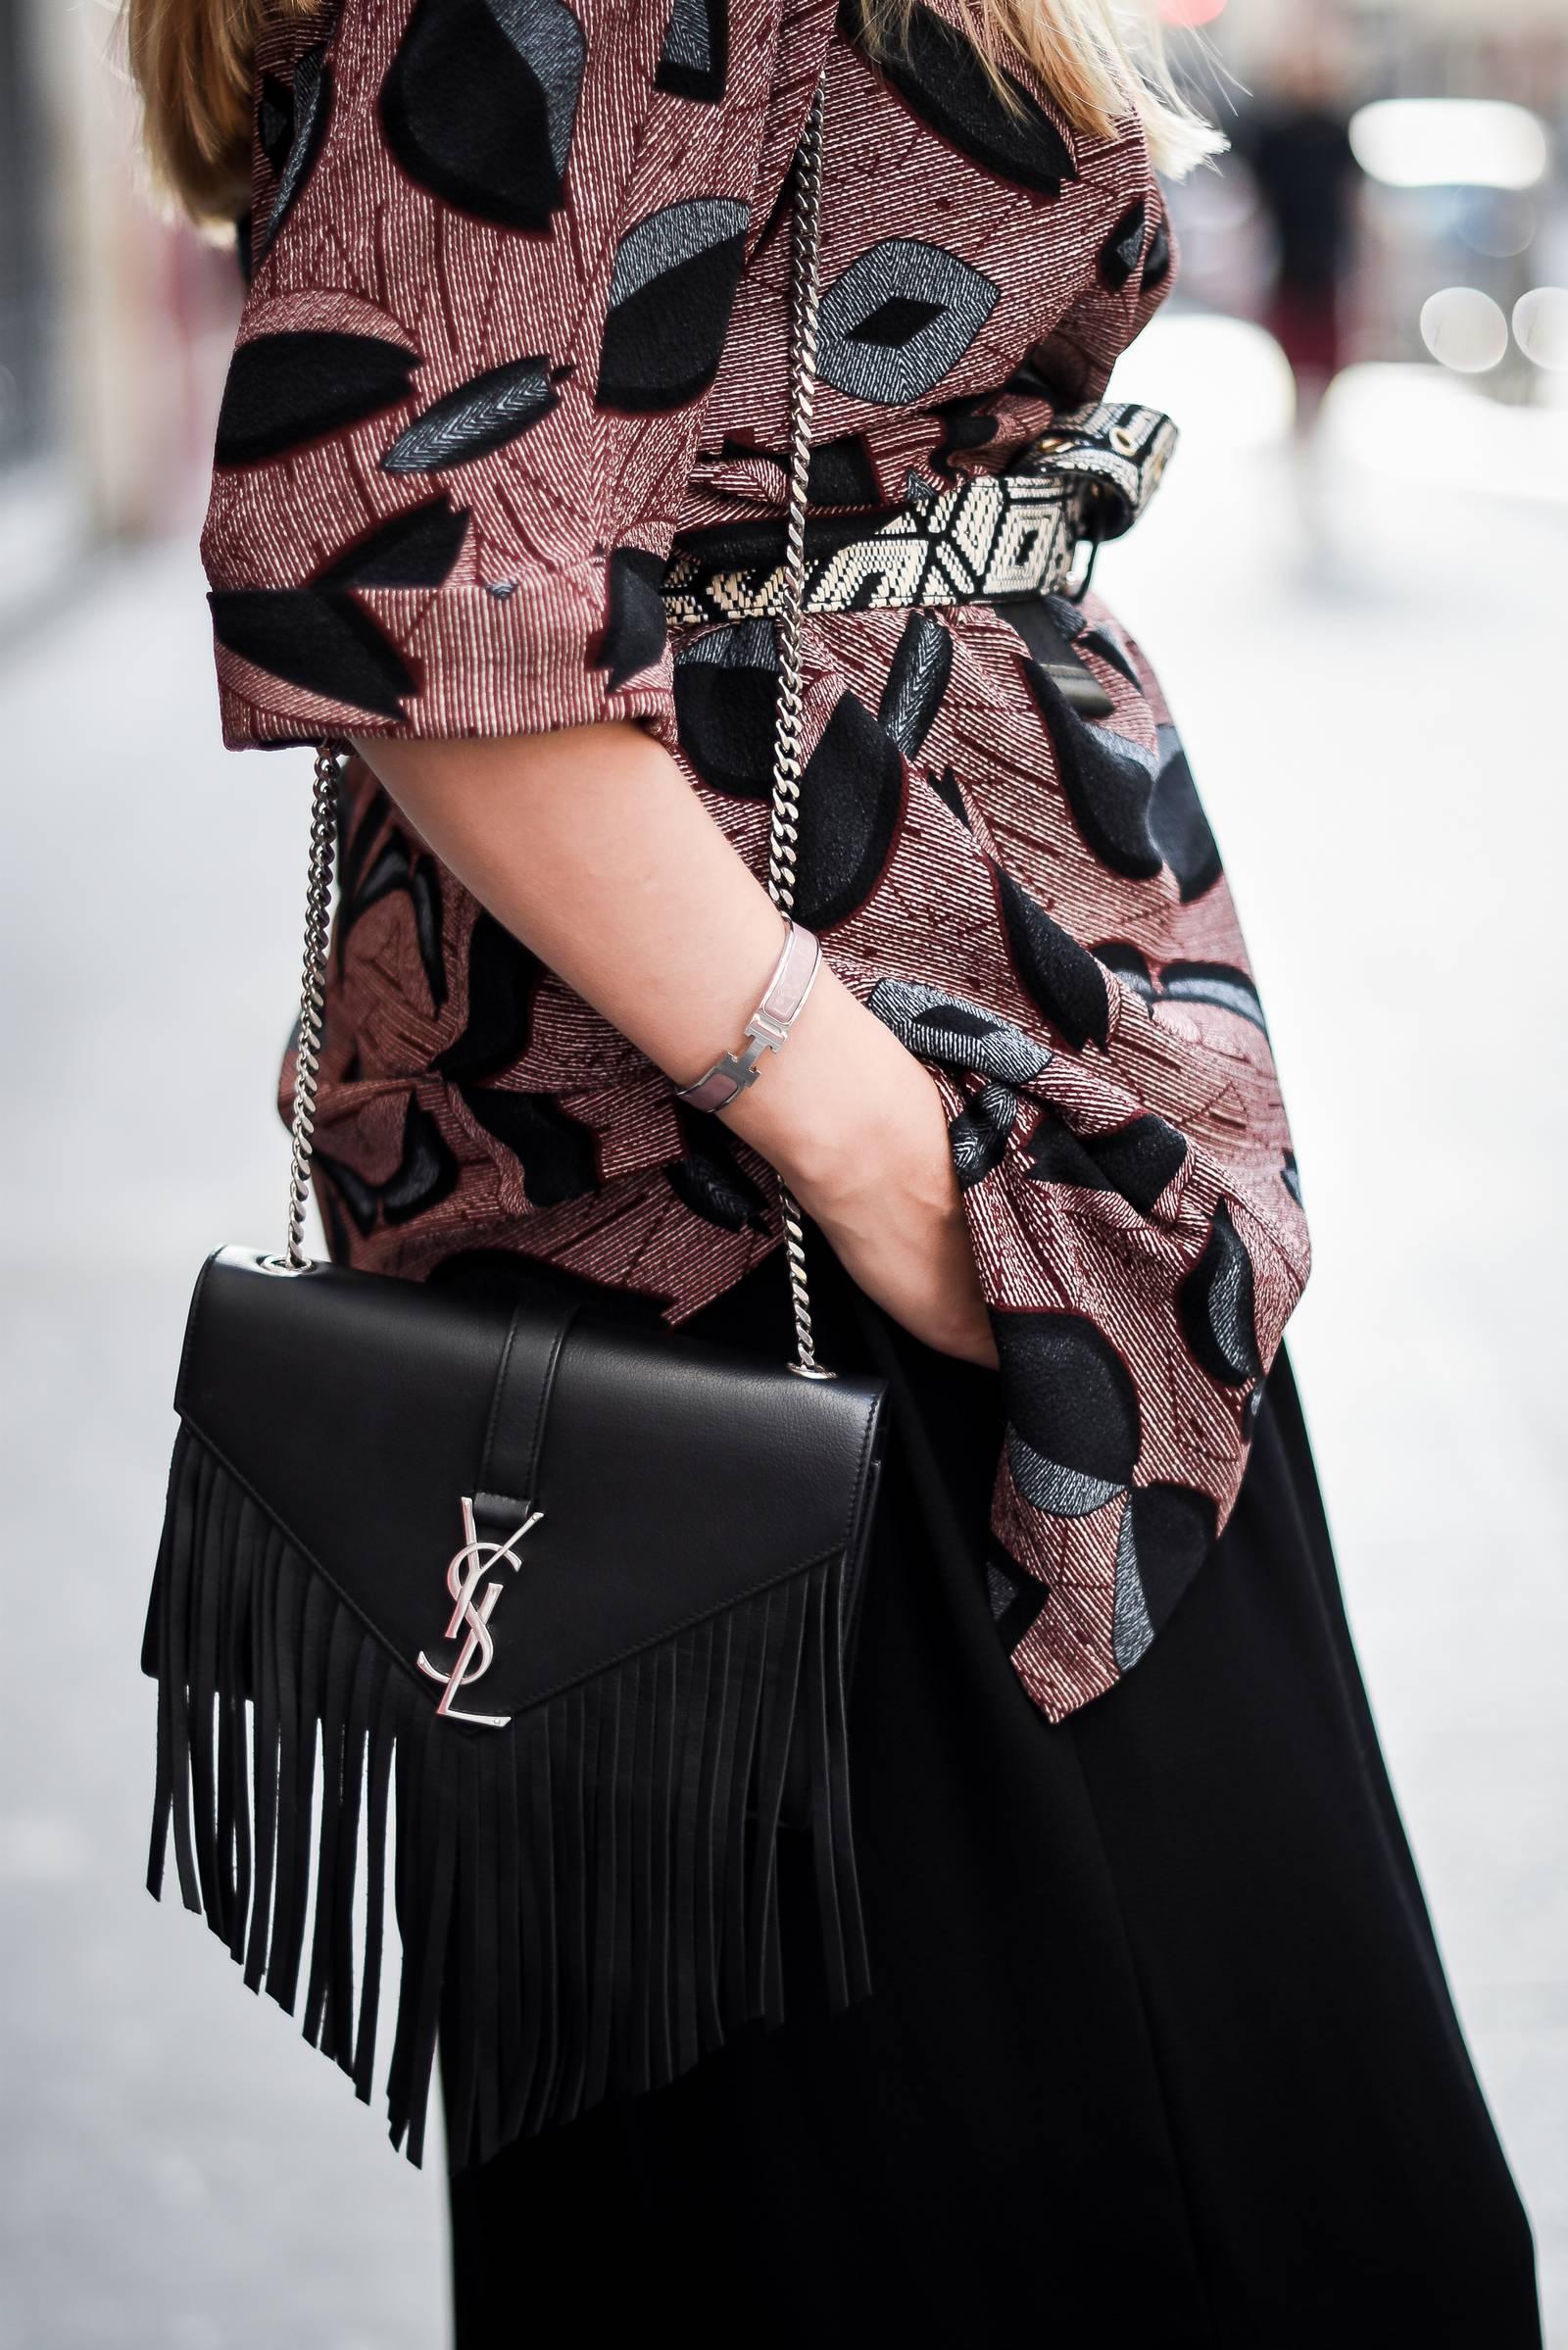 blog mode - Comment s'habiller pour aller au restaurant 9